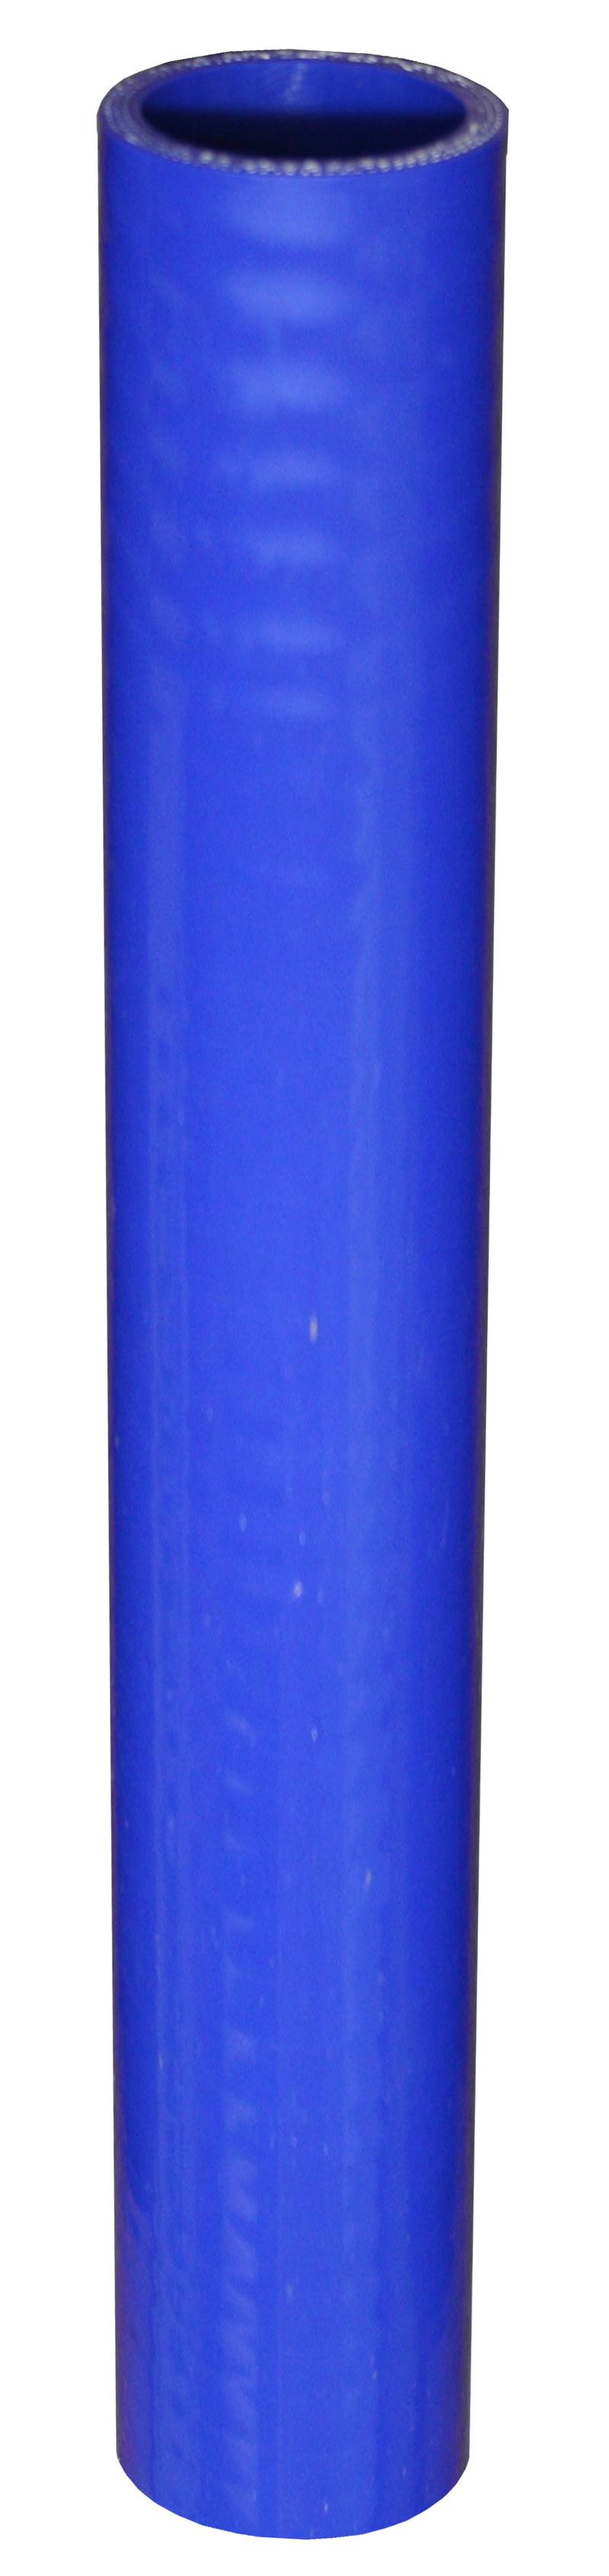 Silicon  Blue  Radiator   Hose  6 Inch Length  1.25 I.D.